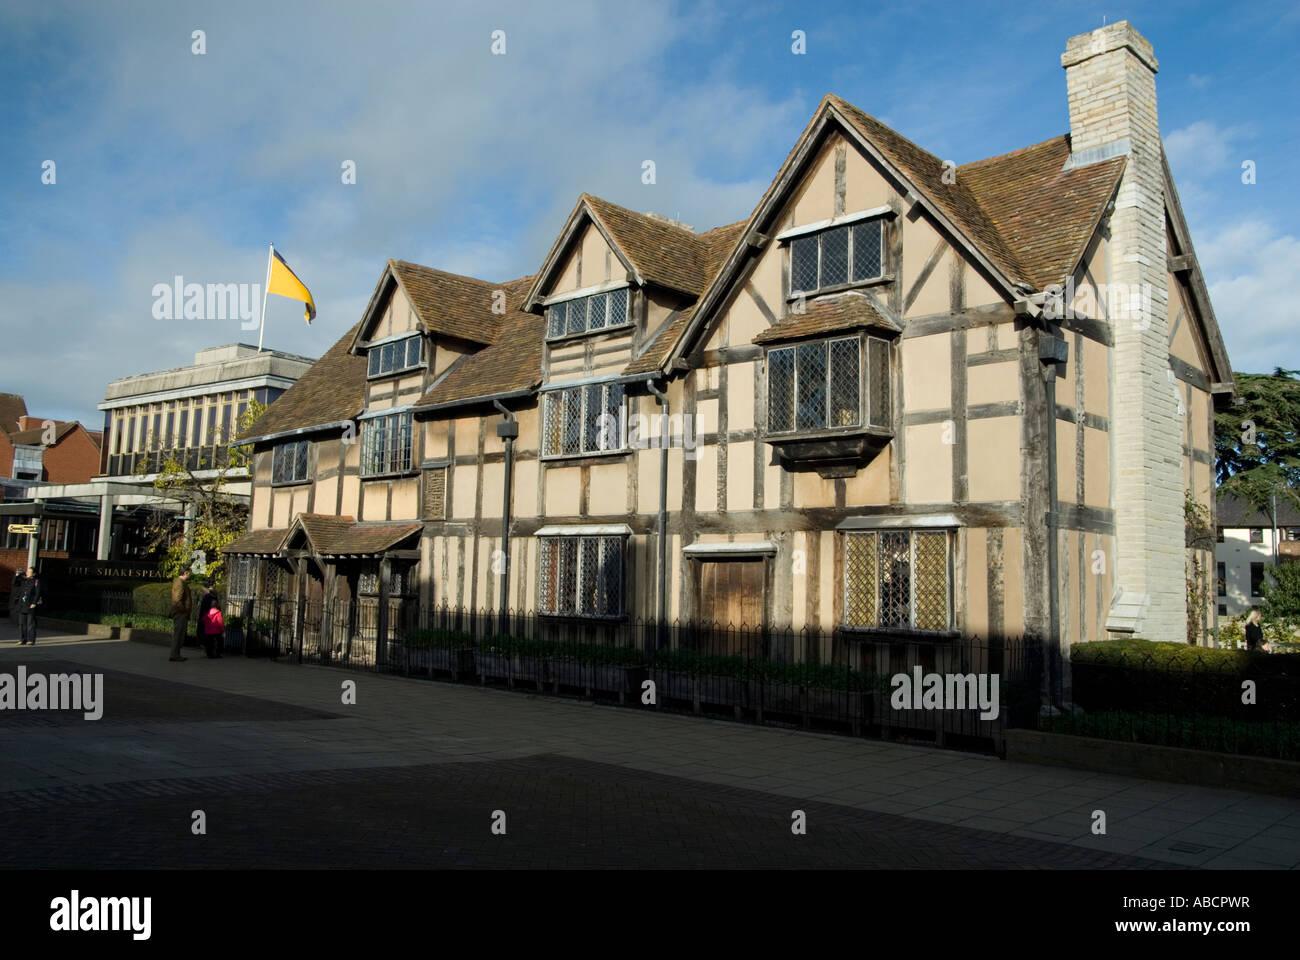 Shakespeare Birth Place In Windsor Street Stratford Upon Avon